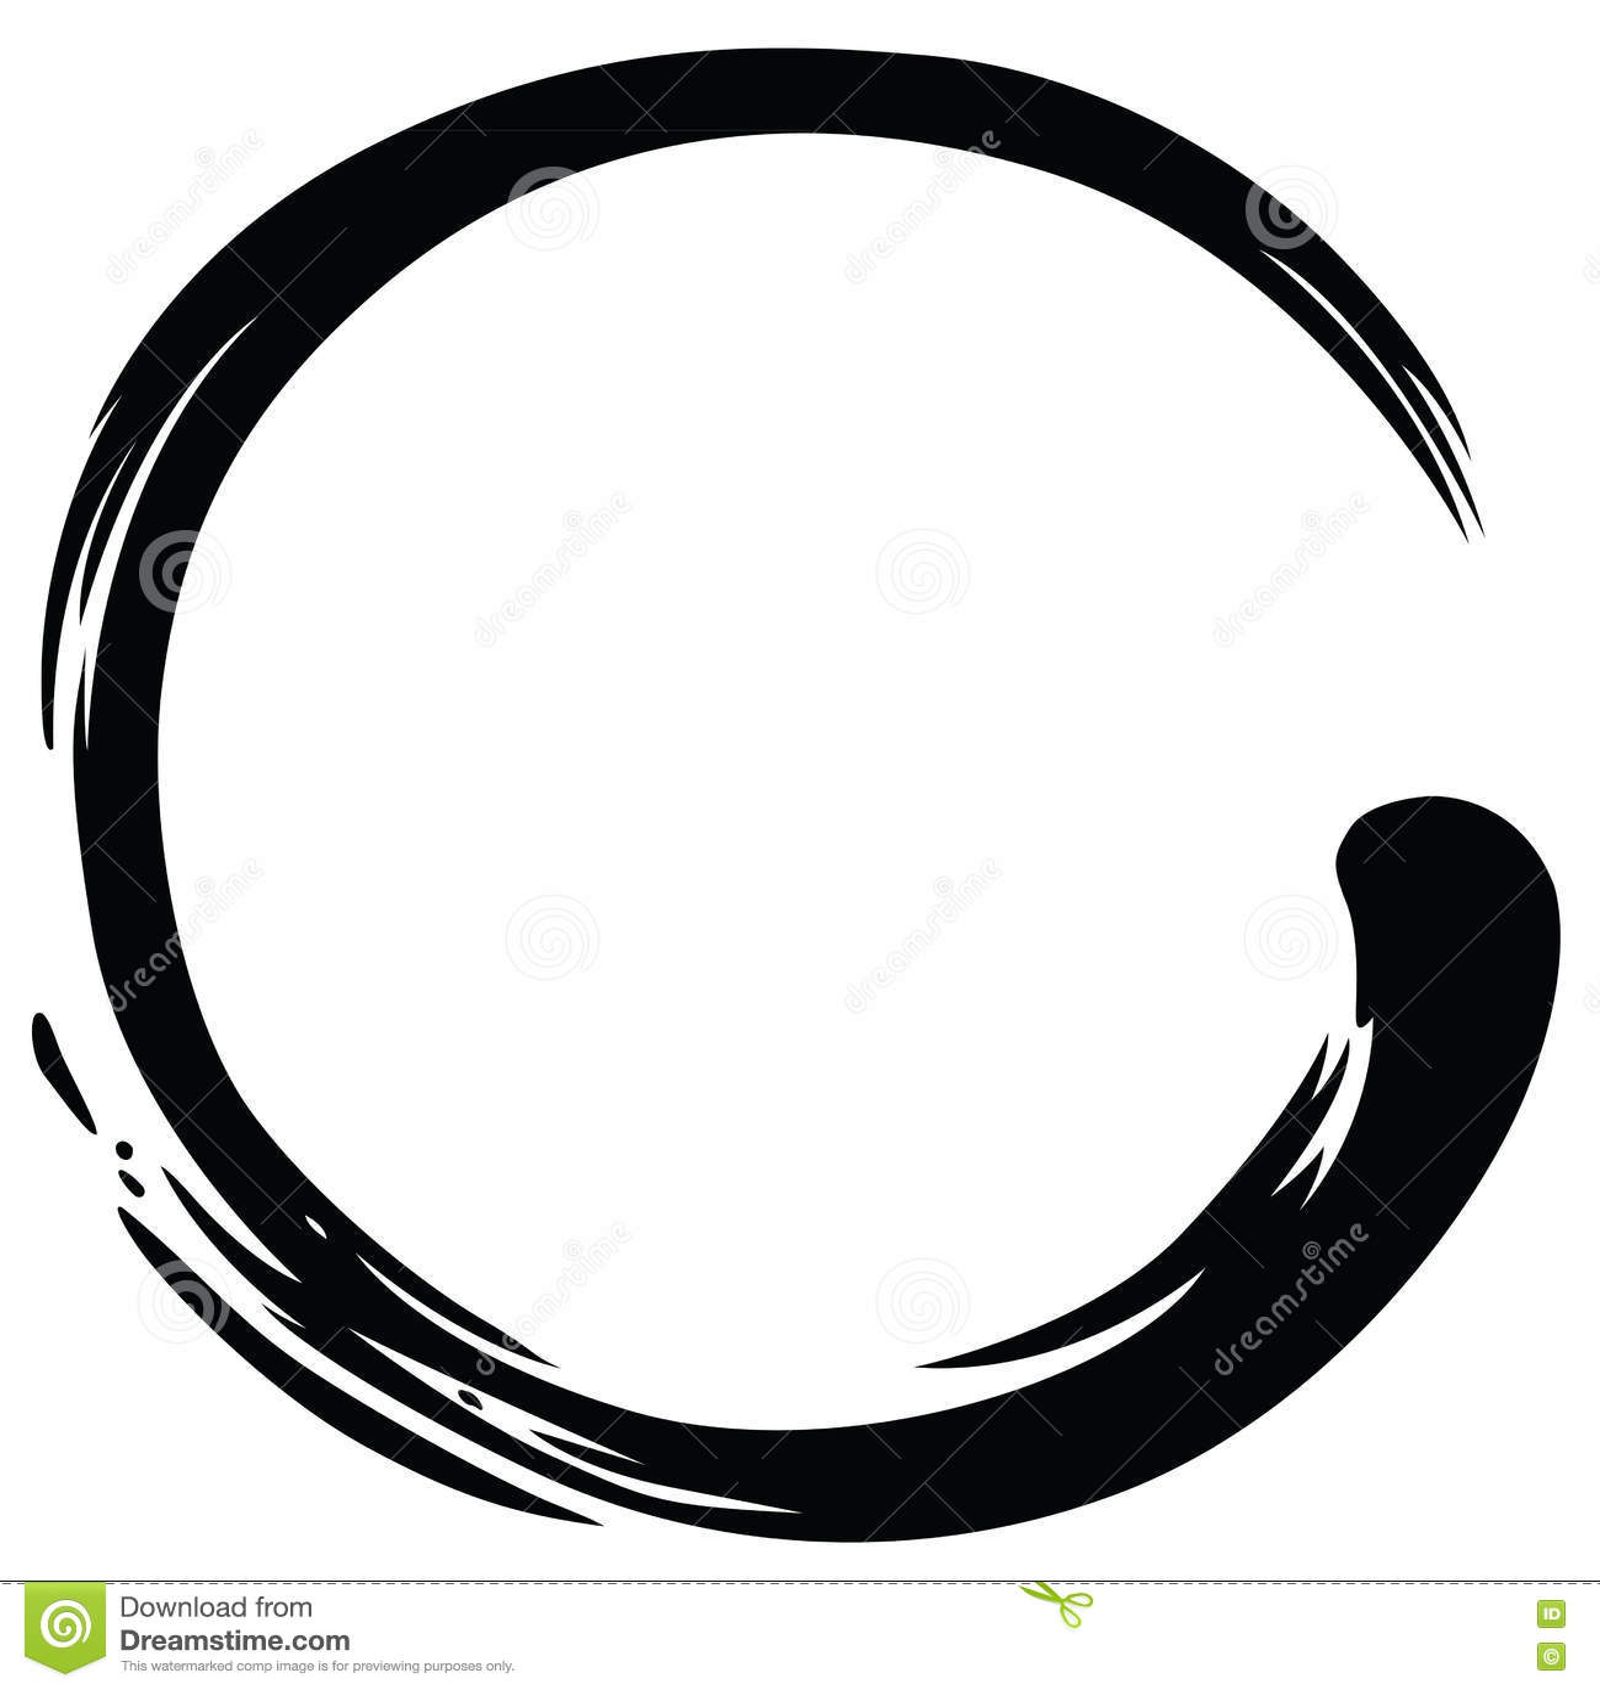 Vecteur de Zen Circle Paint Brush Stroke